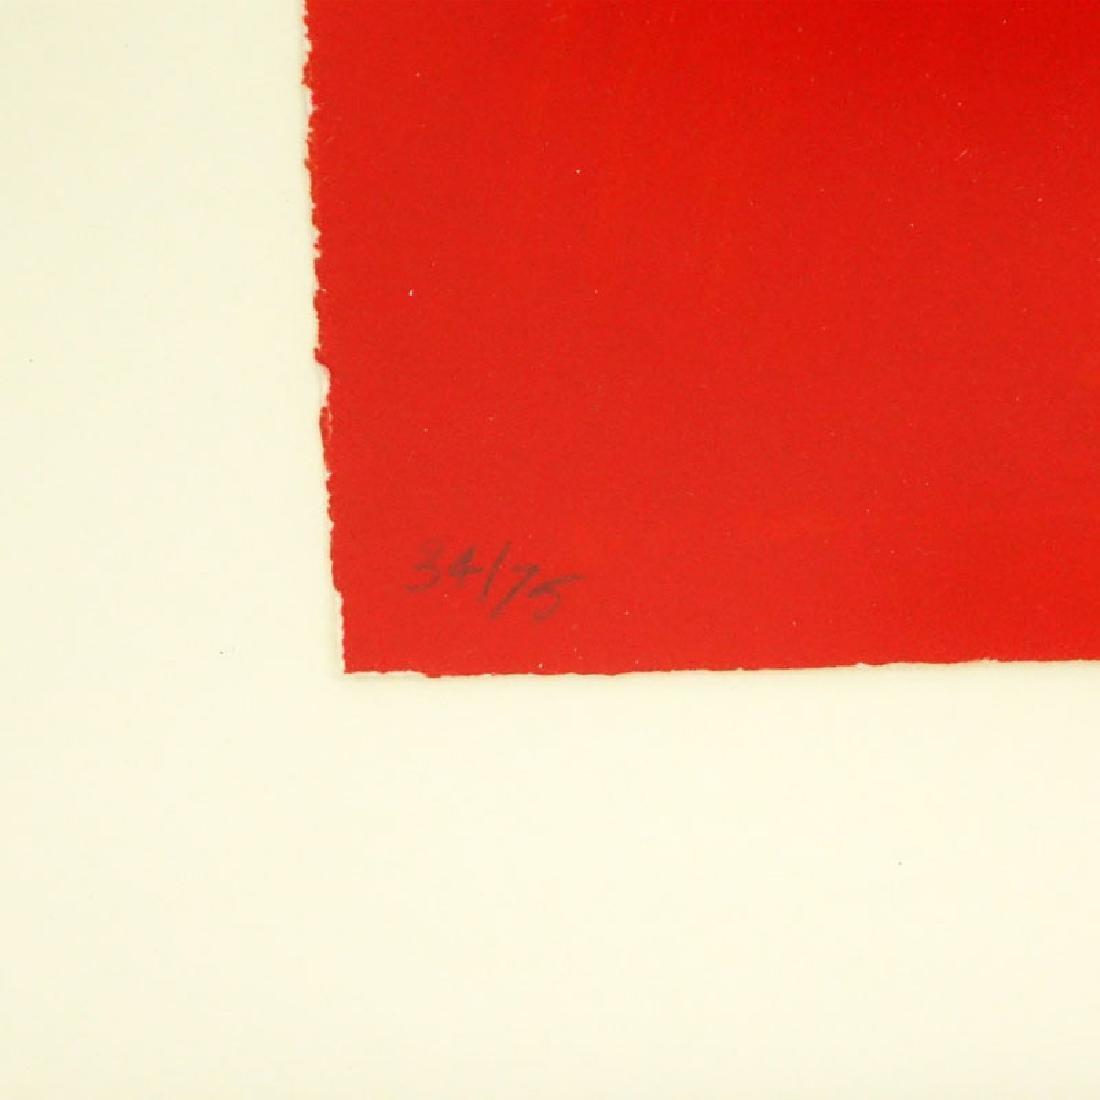 Alexander Calder, American (1898-1976) Color lithograph - 4